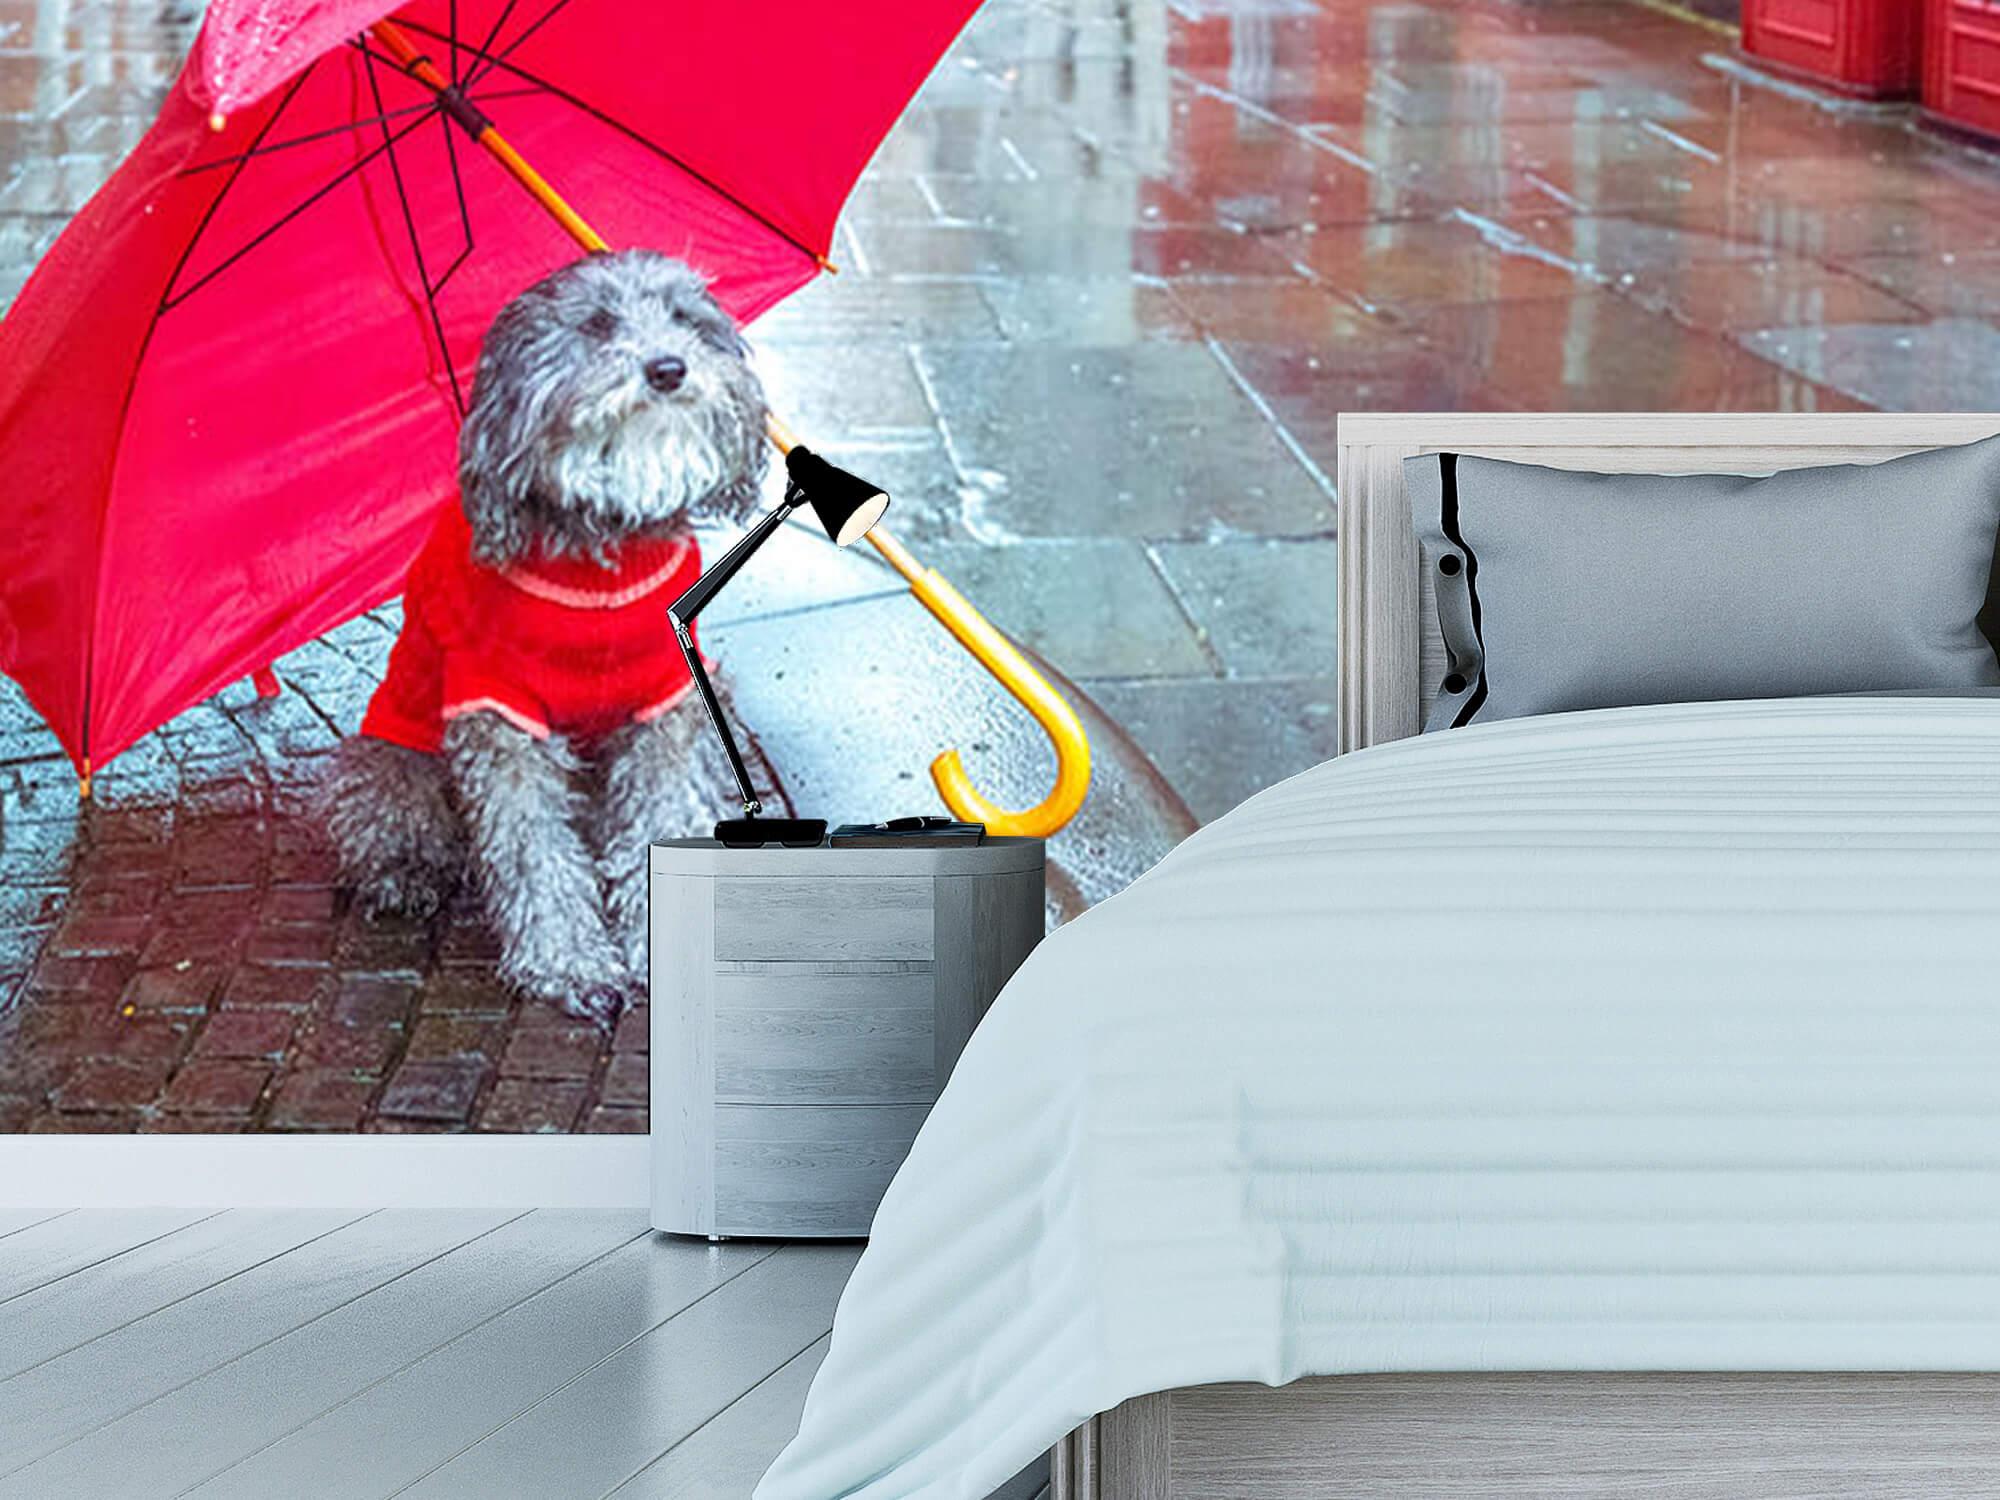 Dog with umbrella 11